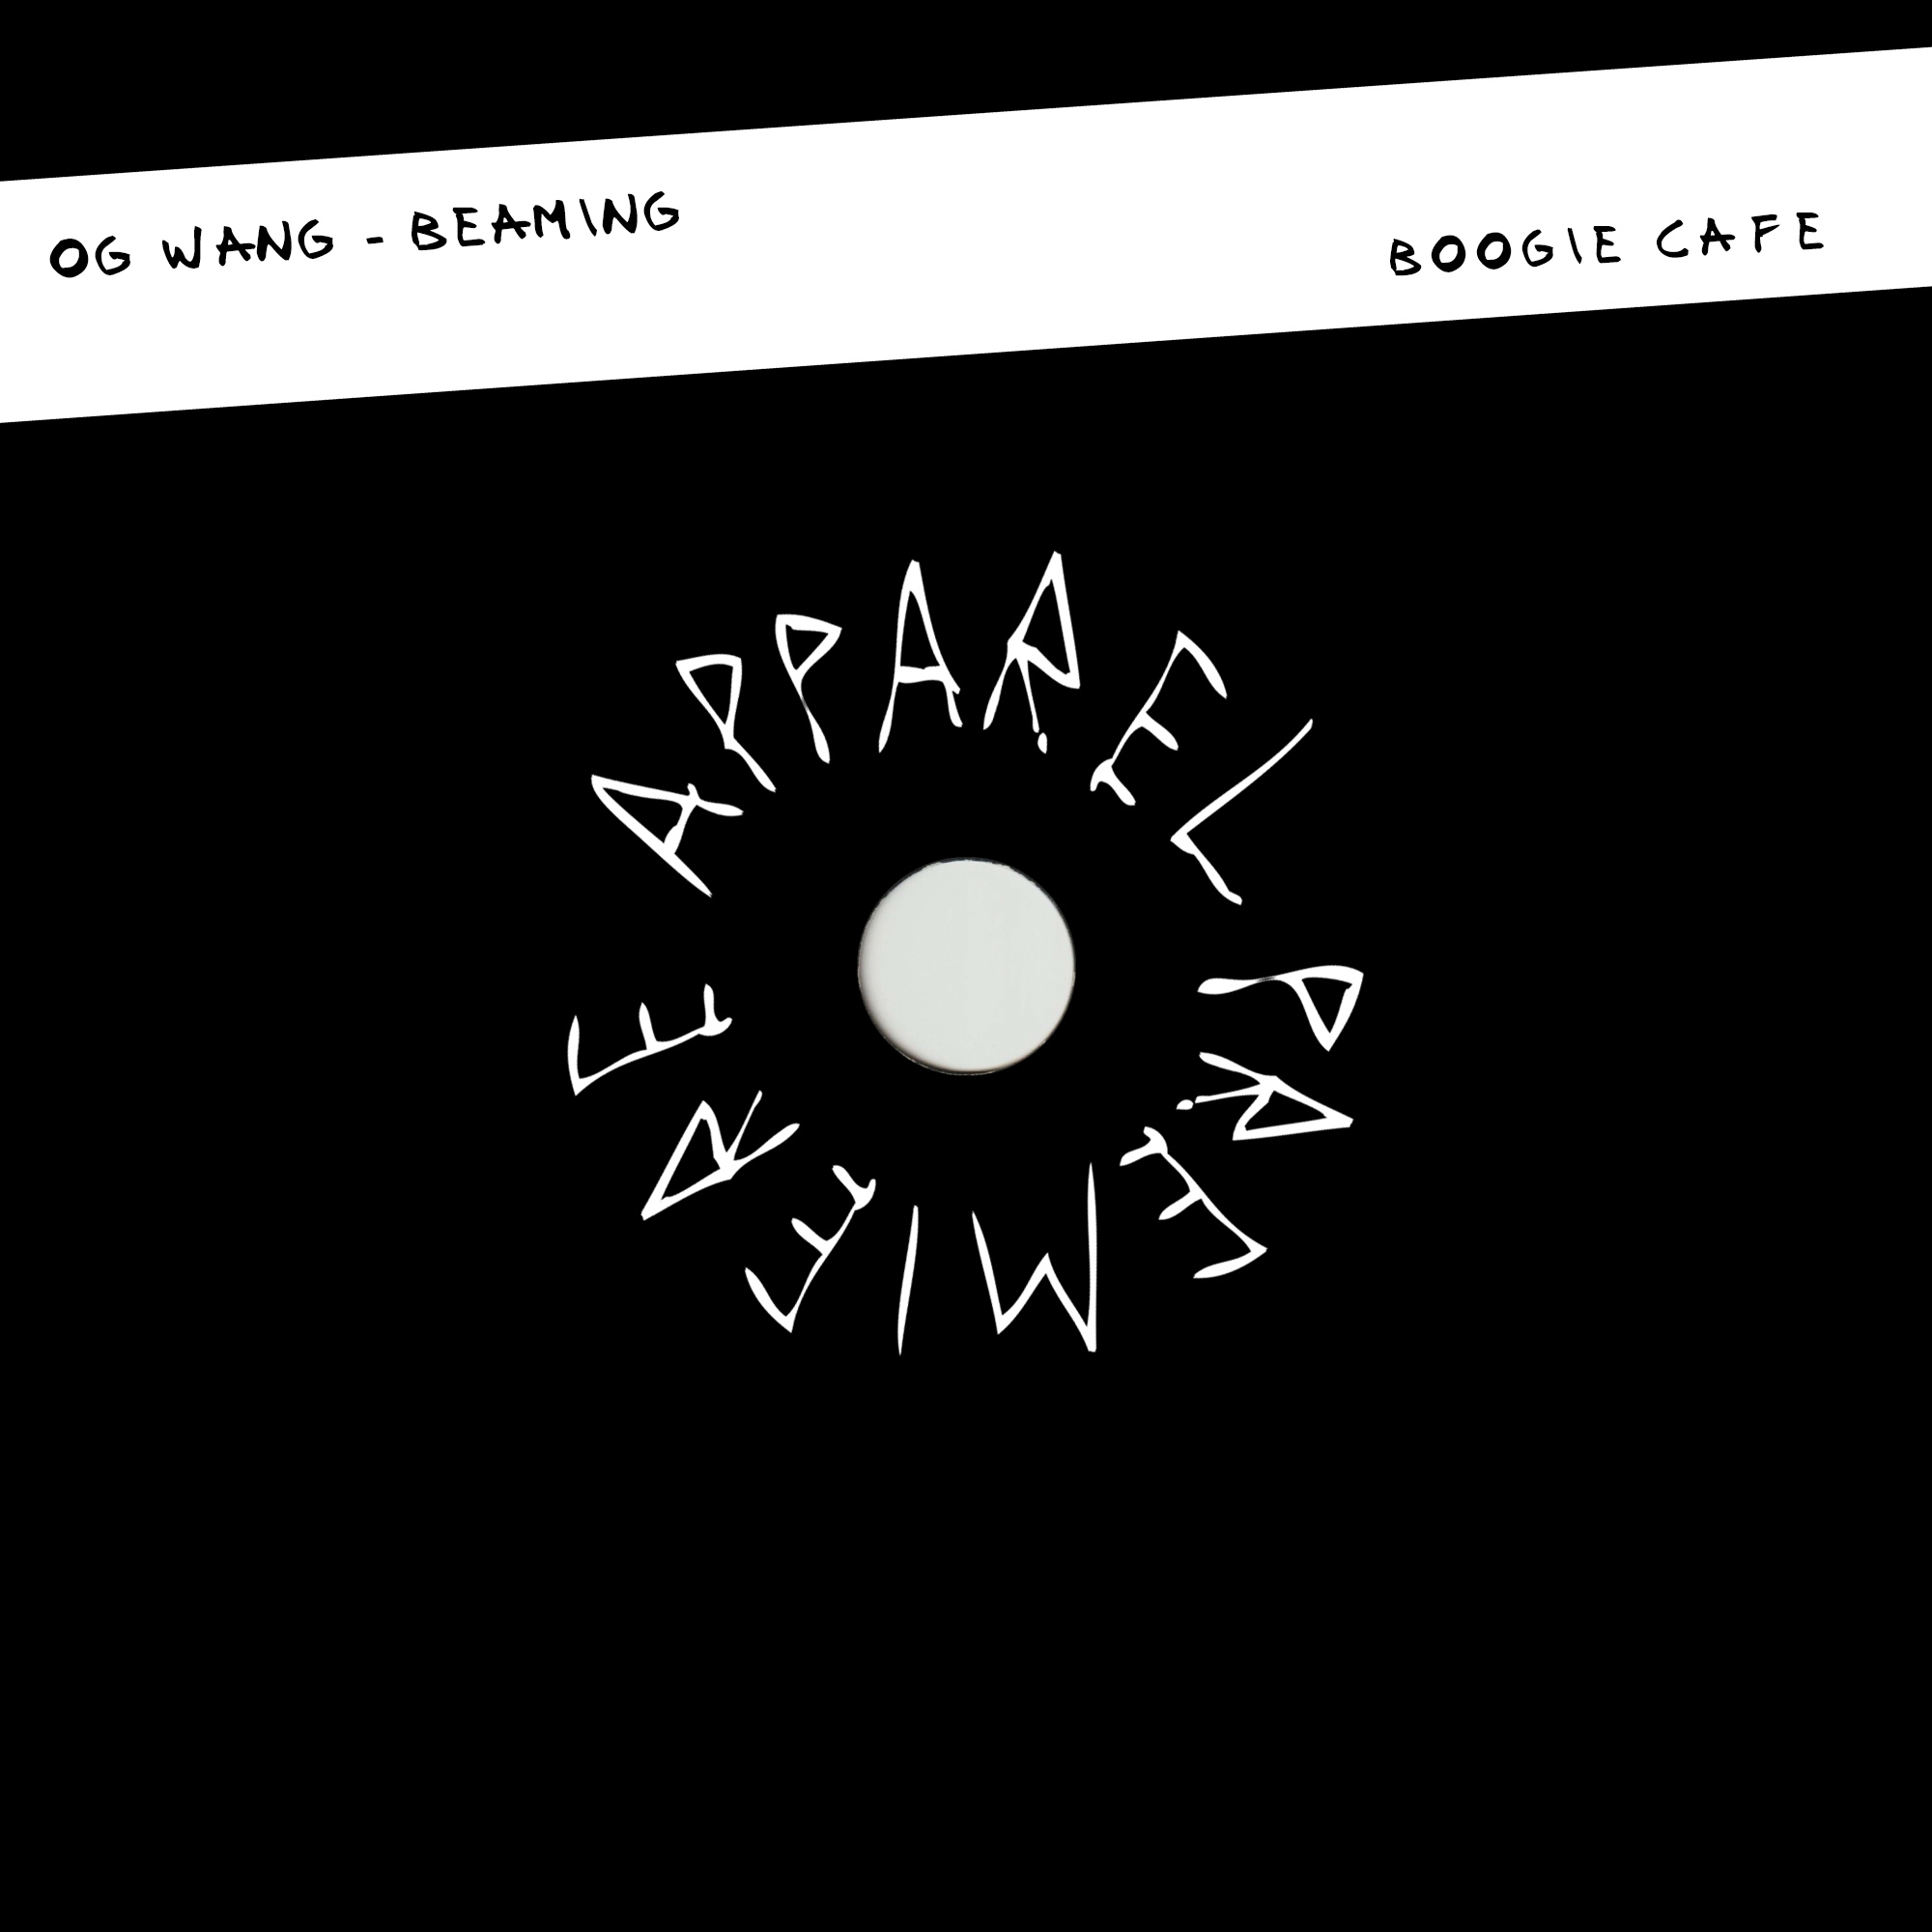 APPAREL PREMIERE OG Wang – Beaming [Boogie Cafe]